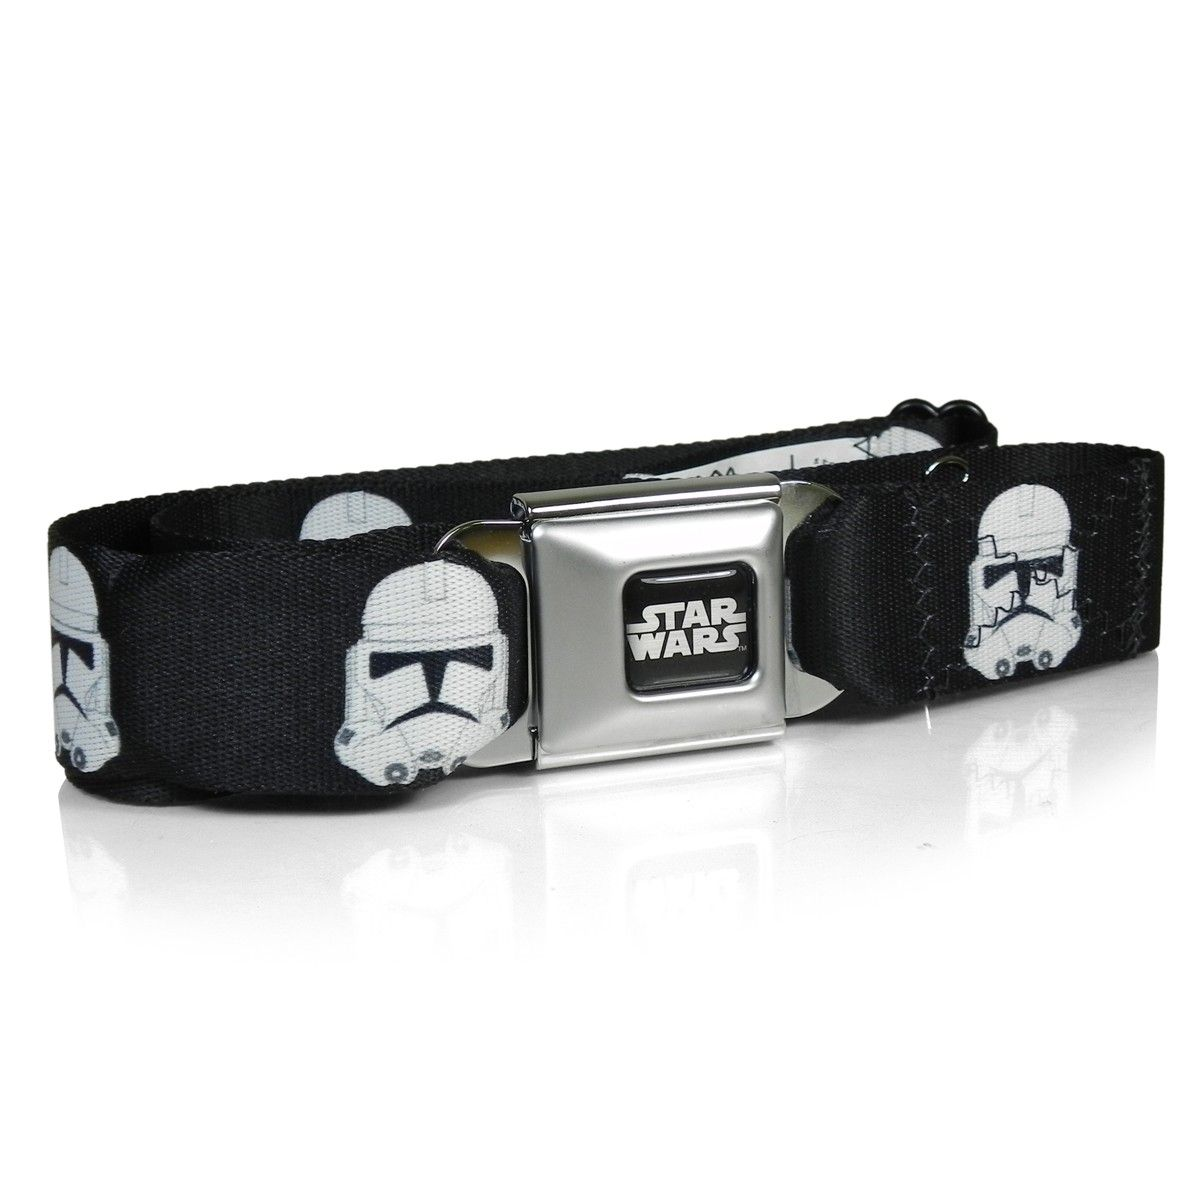 Star Wars Stormtrooper Heads Auto Seatbelt Buckle Strap